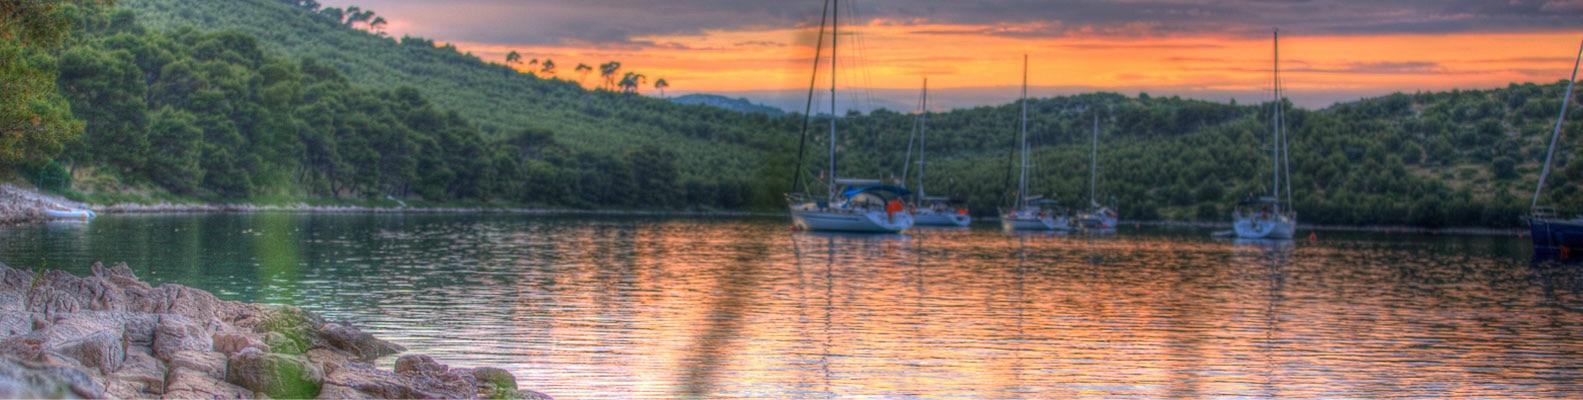 Additional Costs of Flotilla Sailing Holiday in Croatia